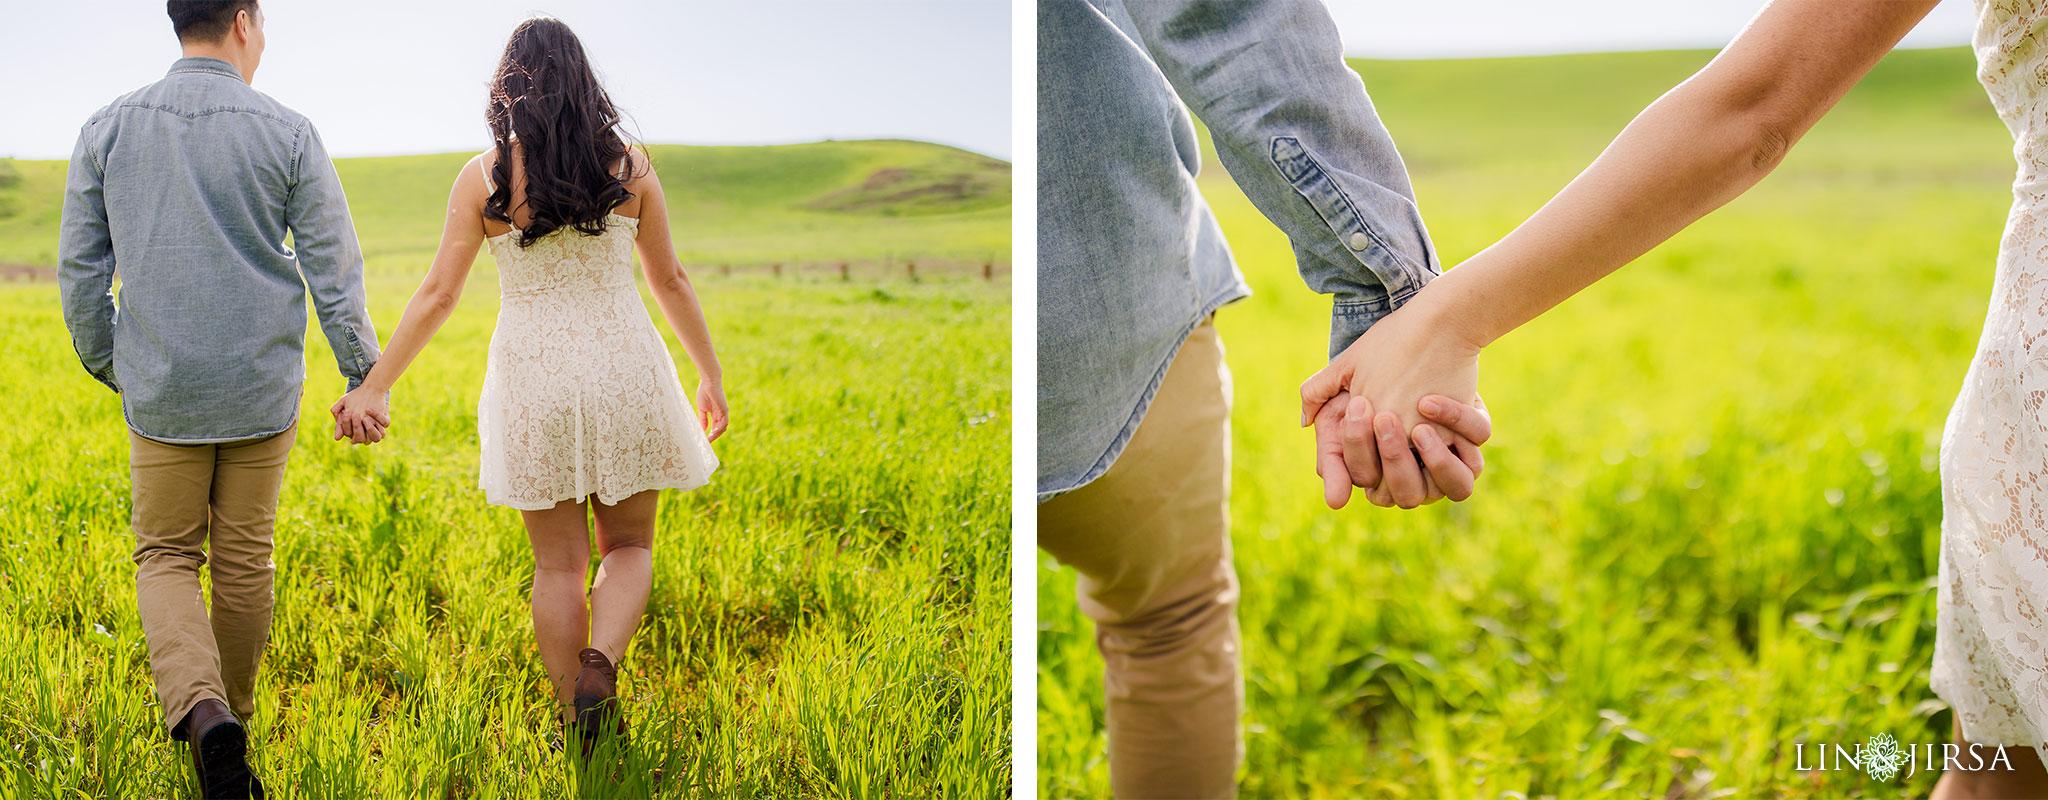 04 Quail Hill Orange County Engagement Photography